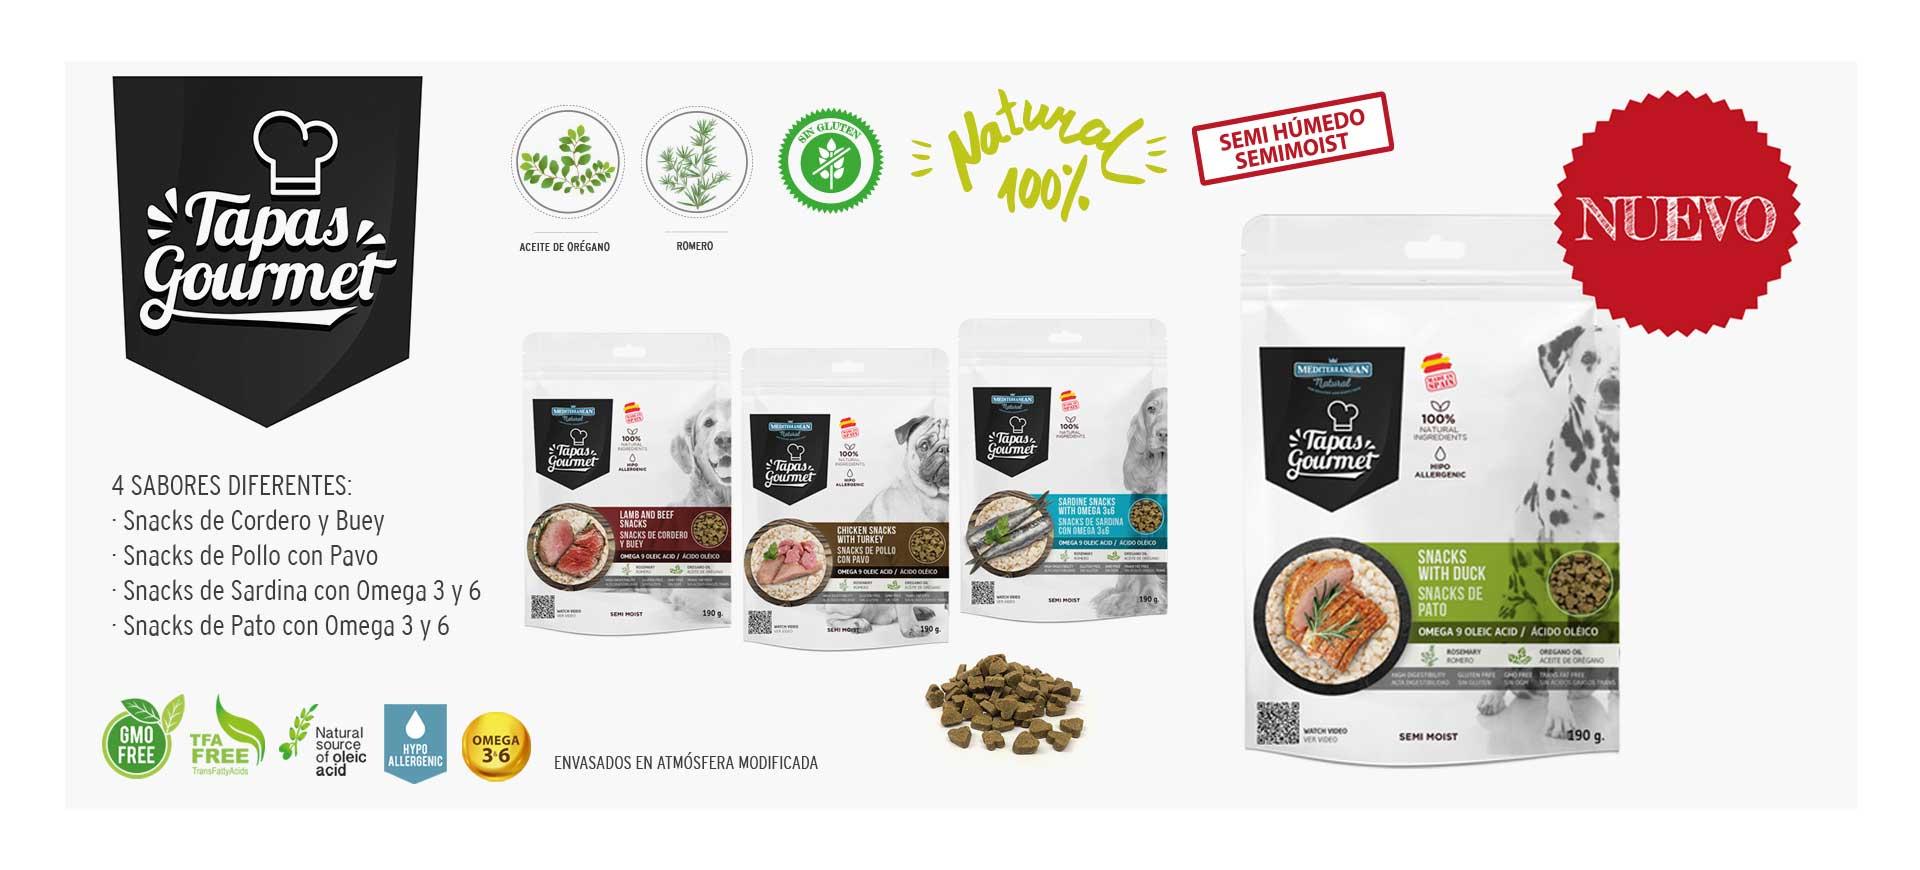 Tapas Gourmet para perros de Mediterranean Natural